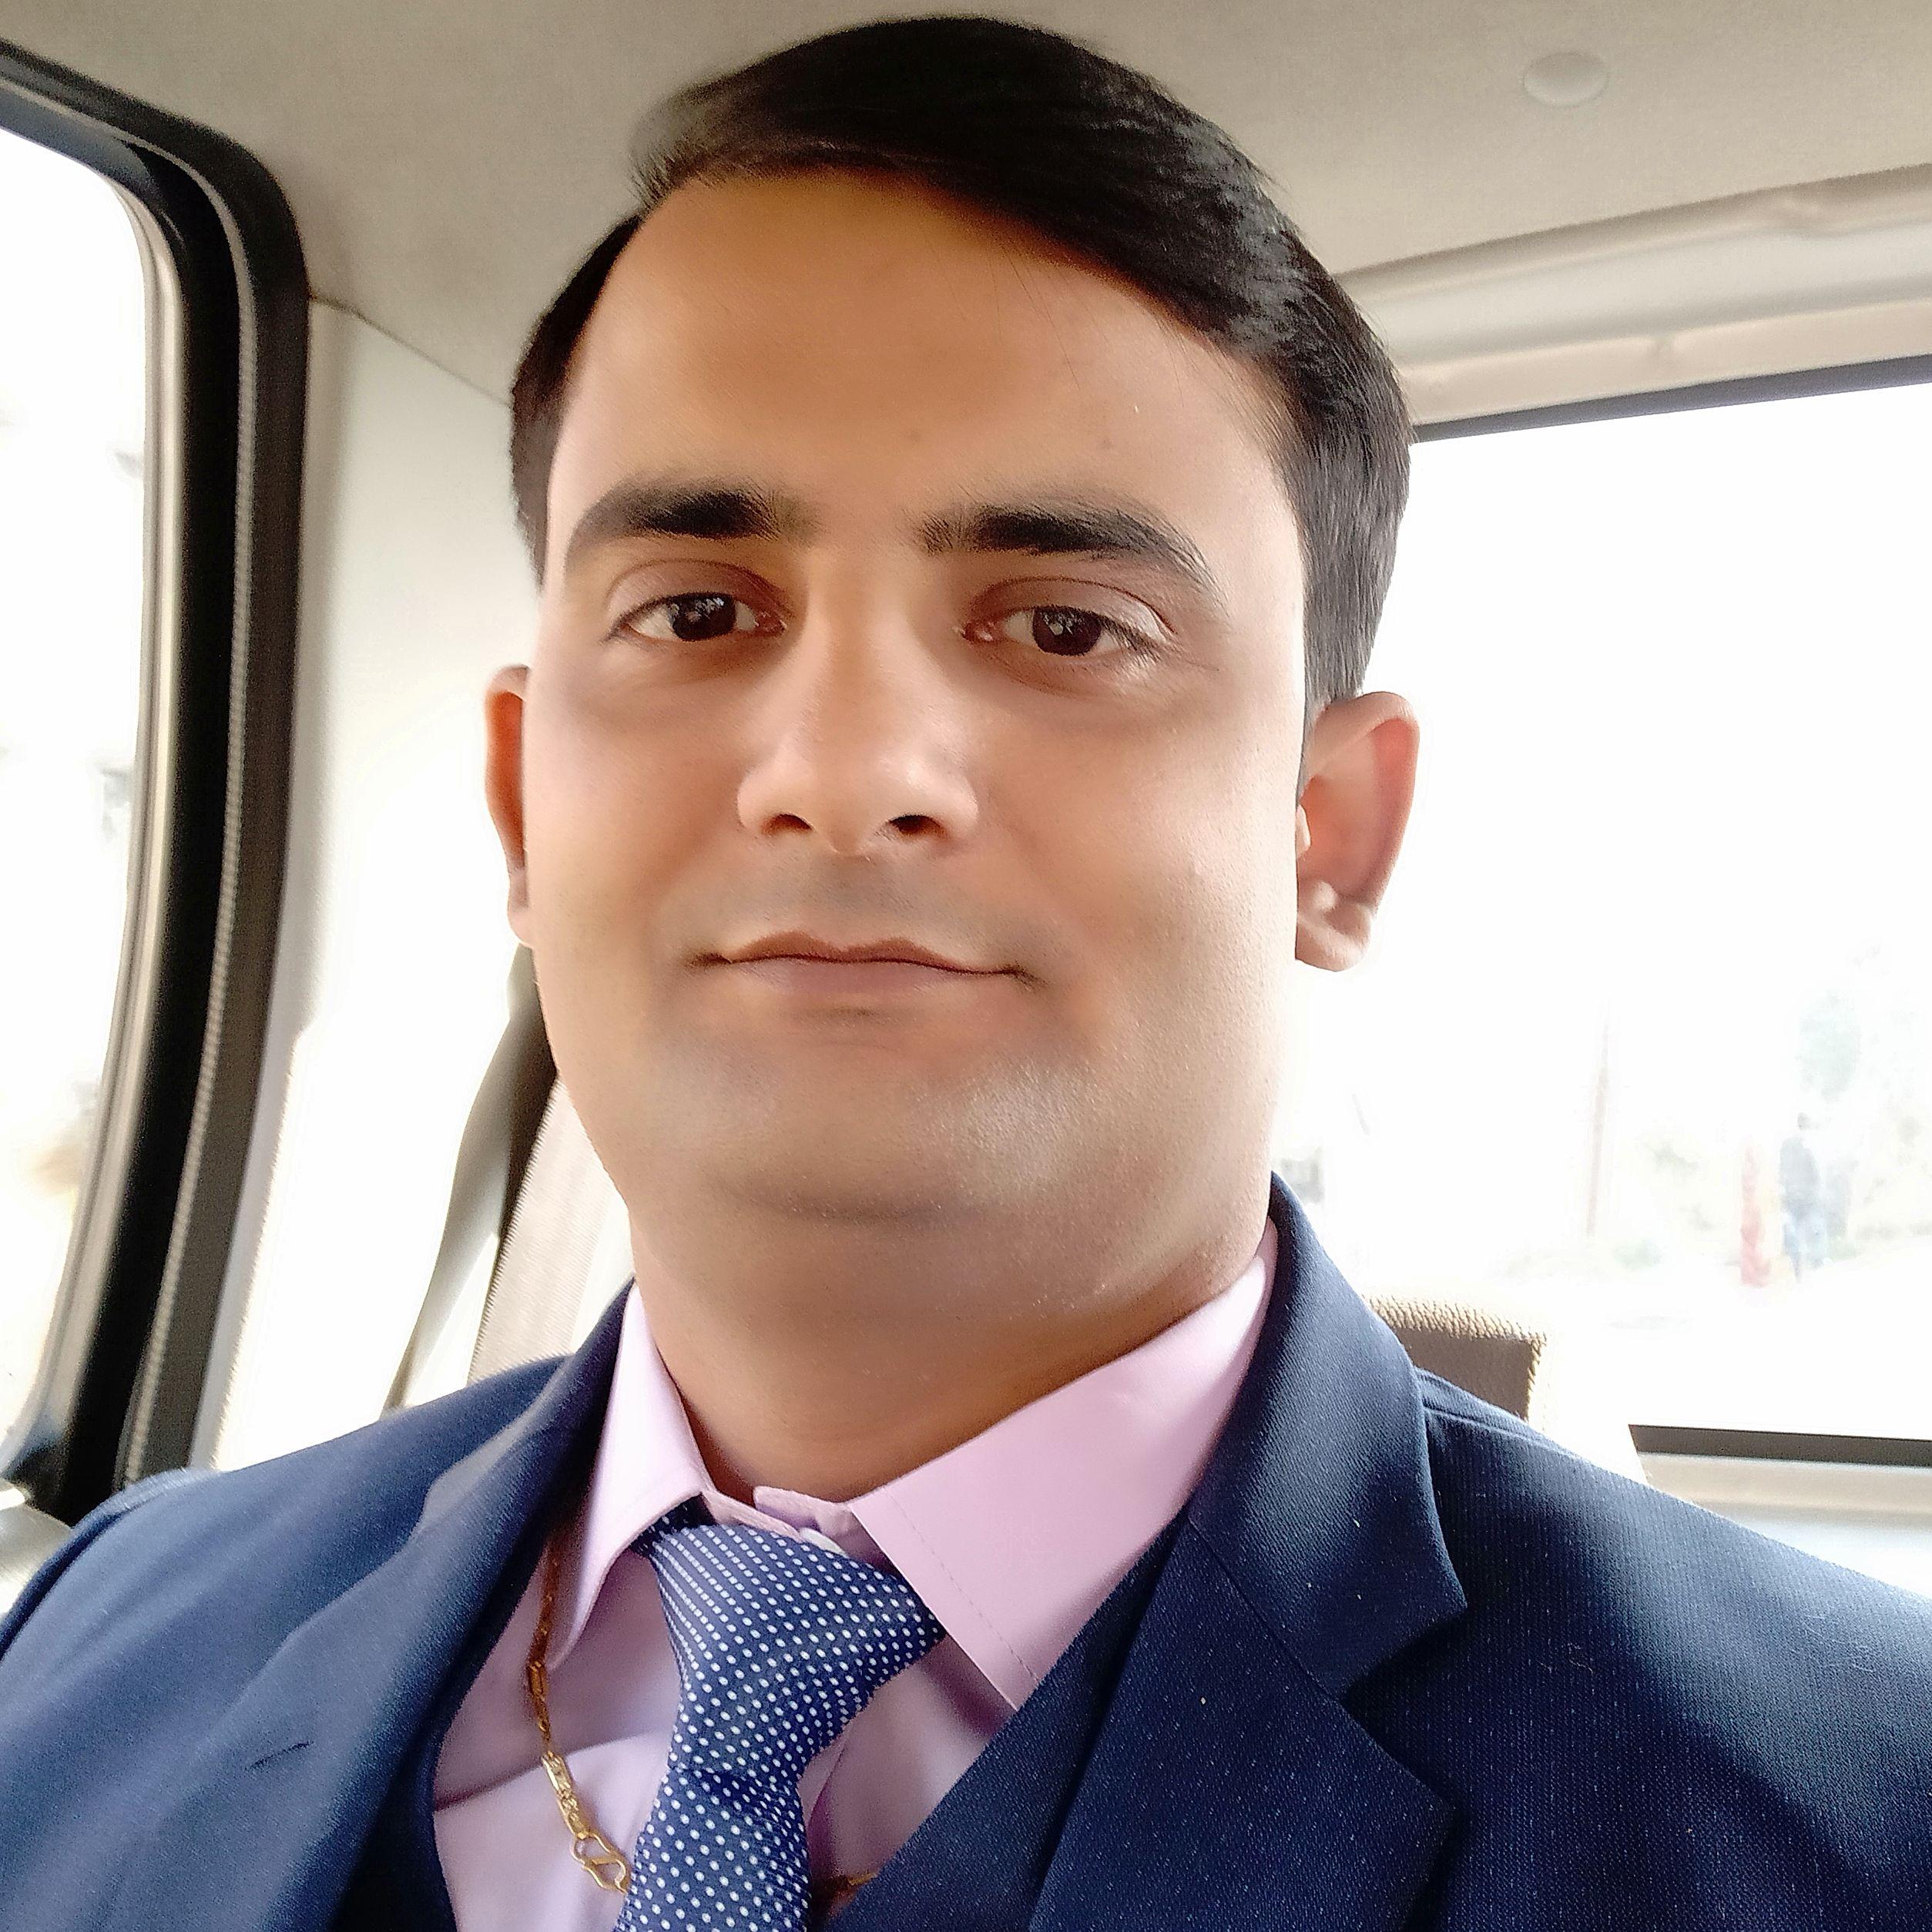 Rajeev Kumar Pandey